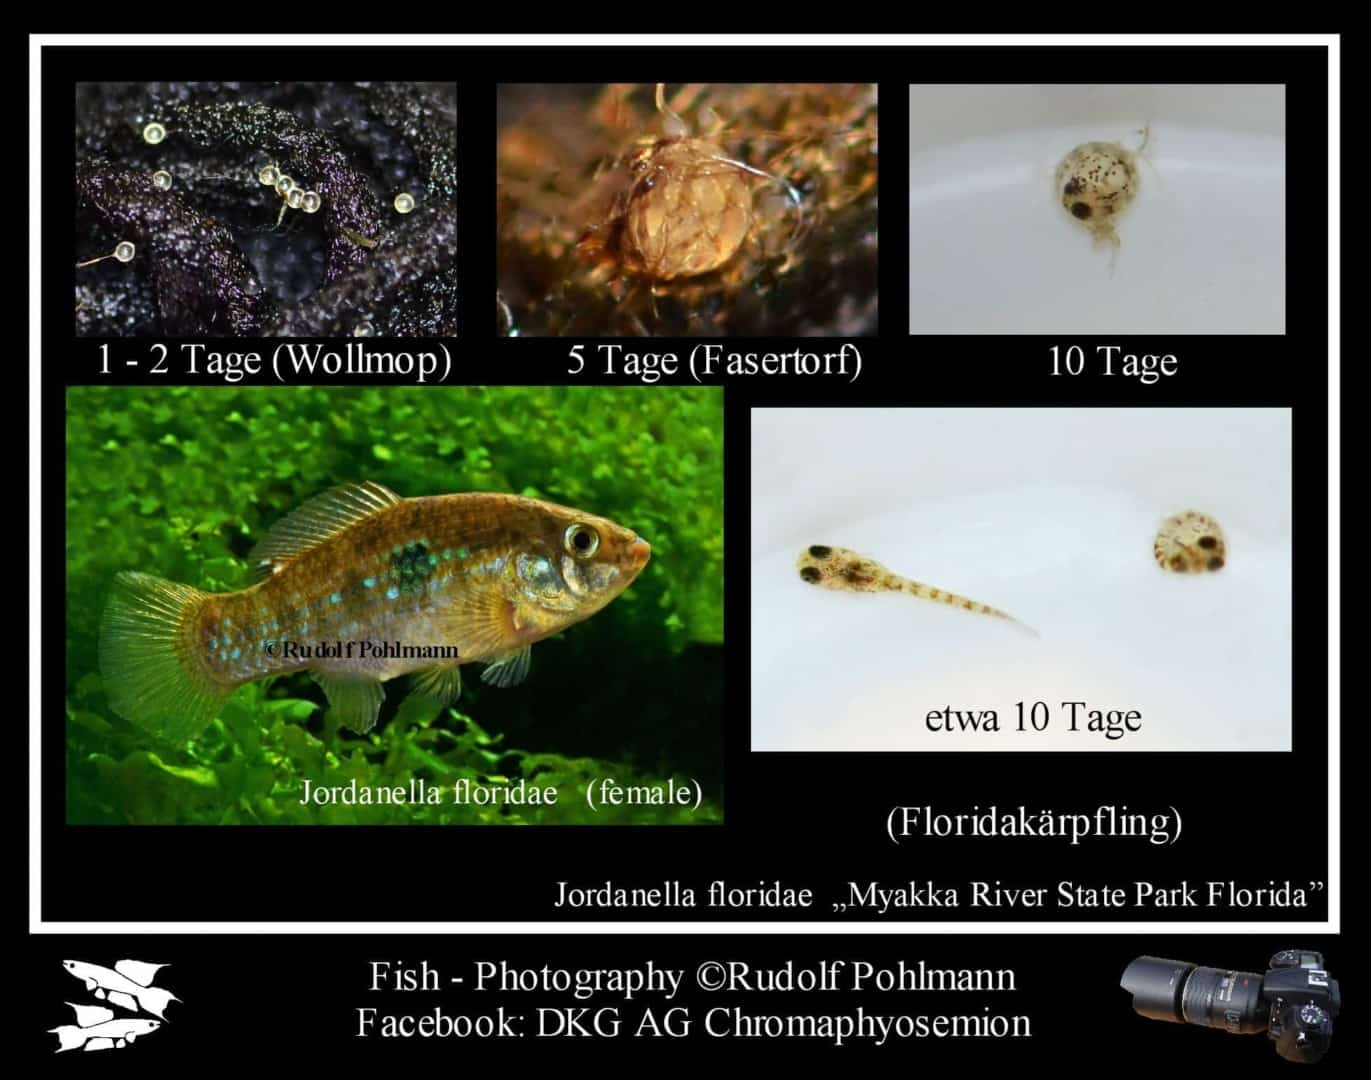 Jordanella floridae - Floridakärpfling 2